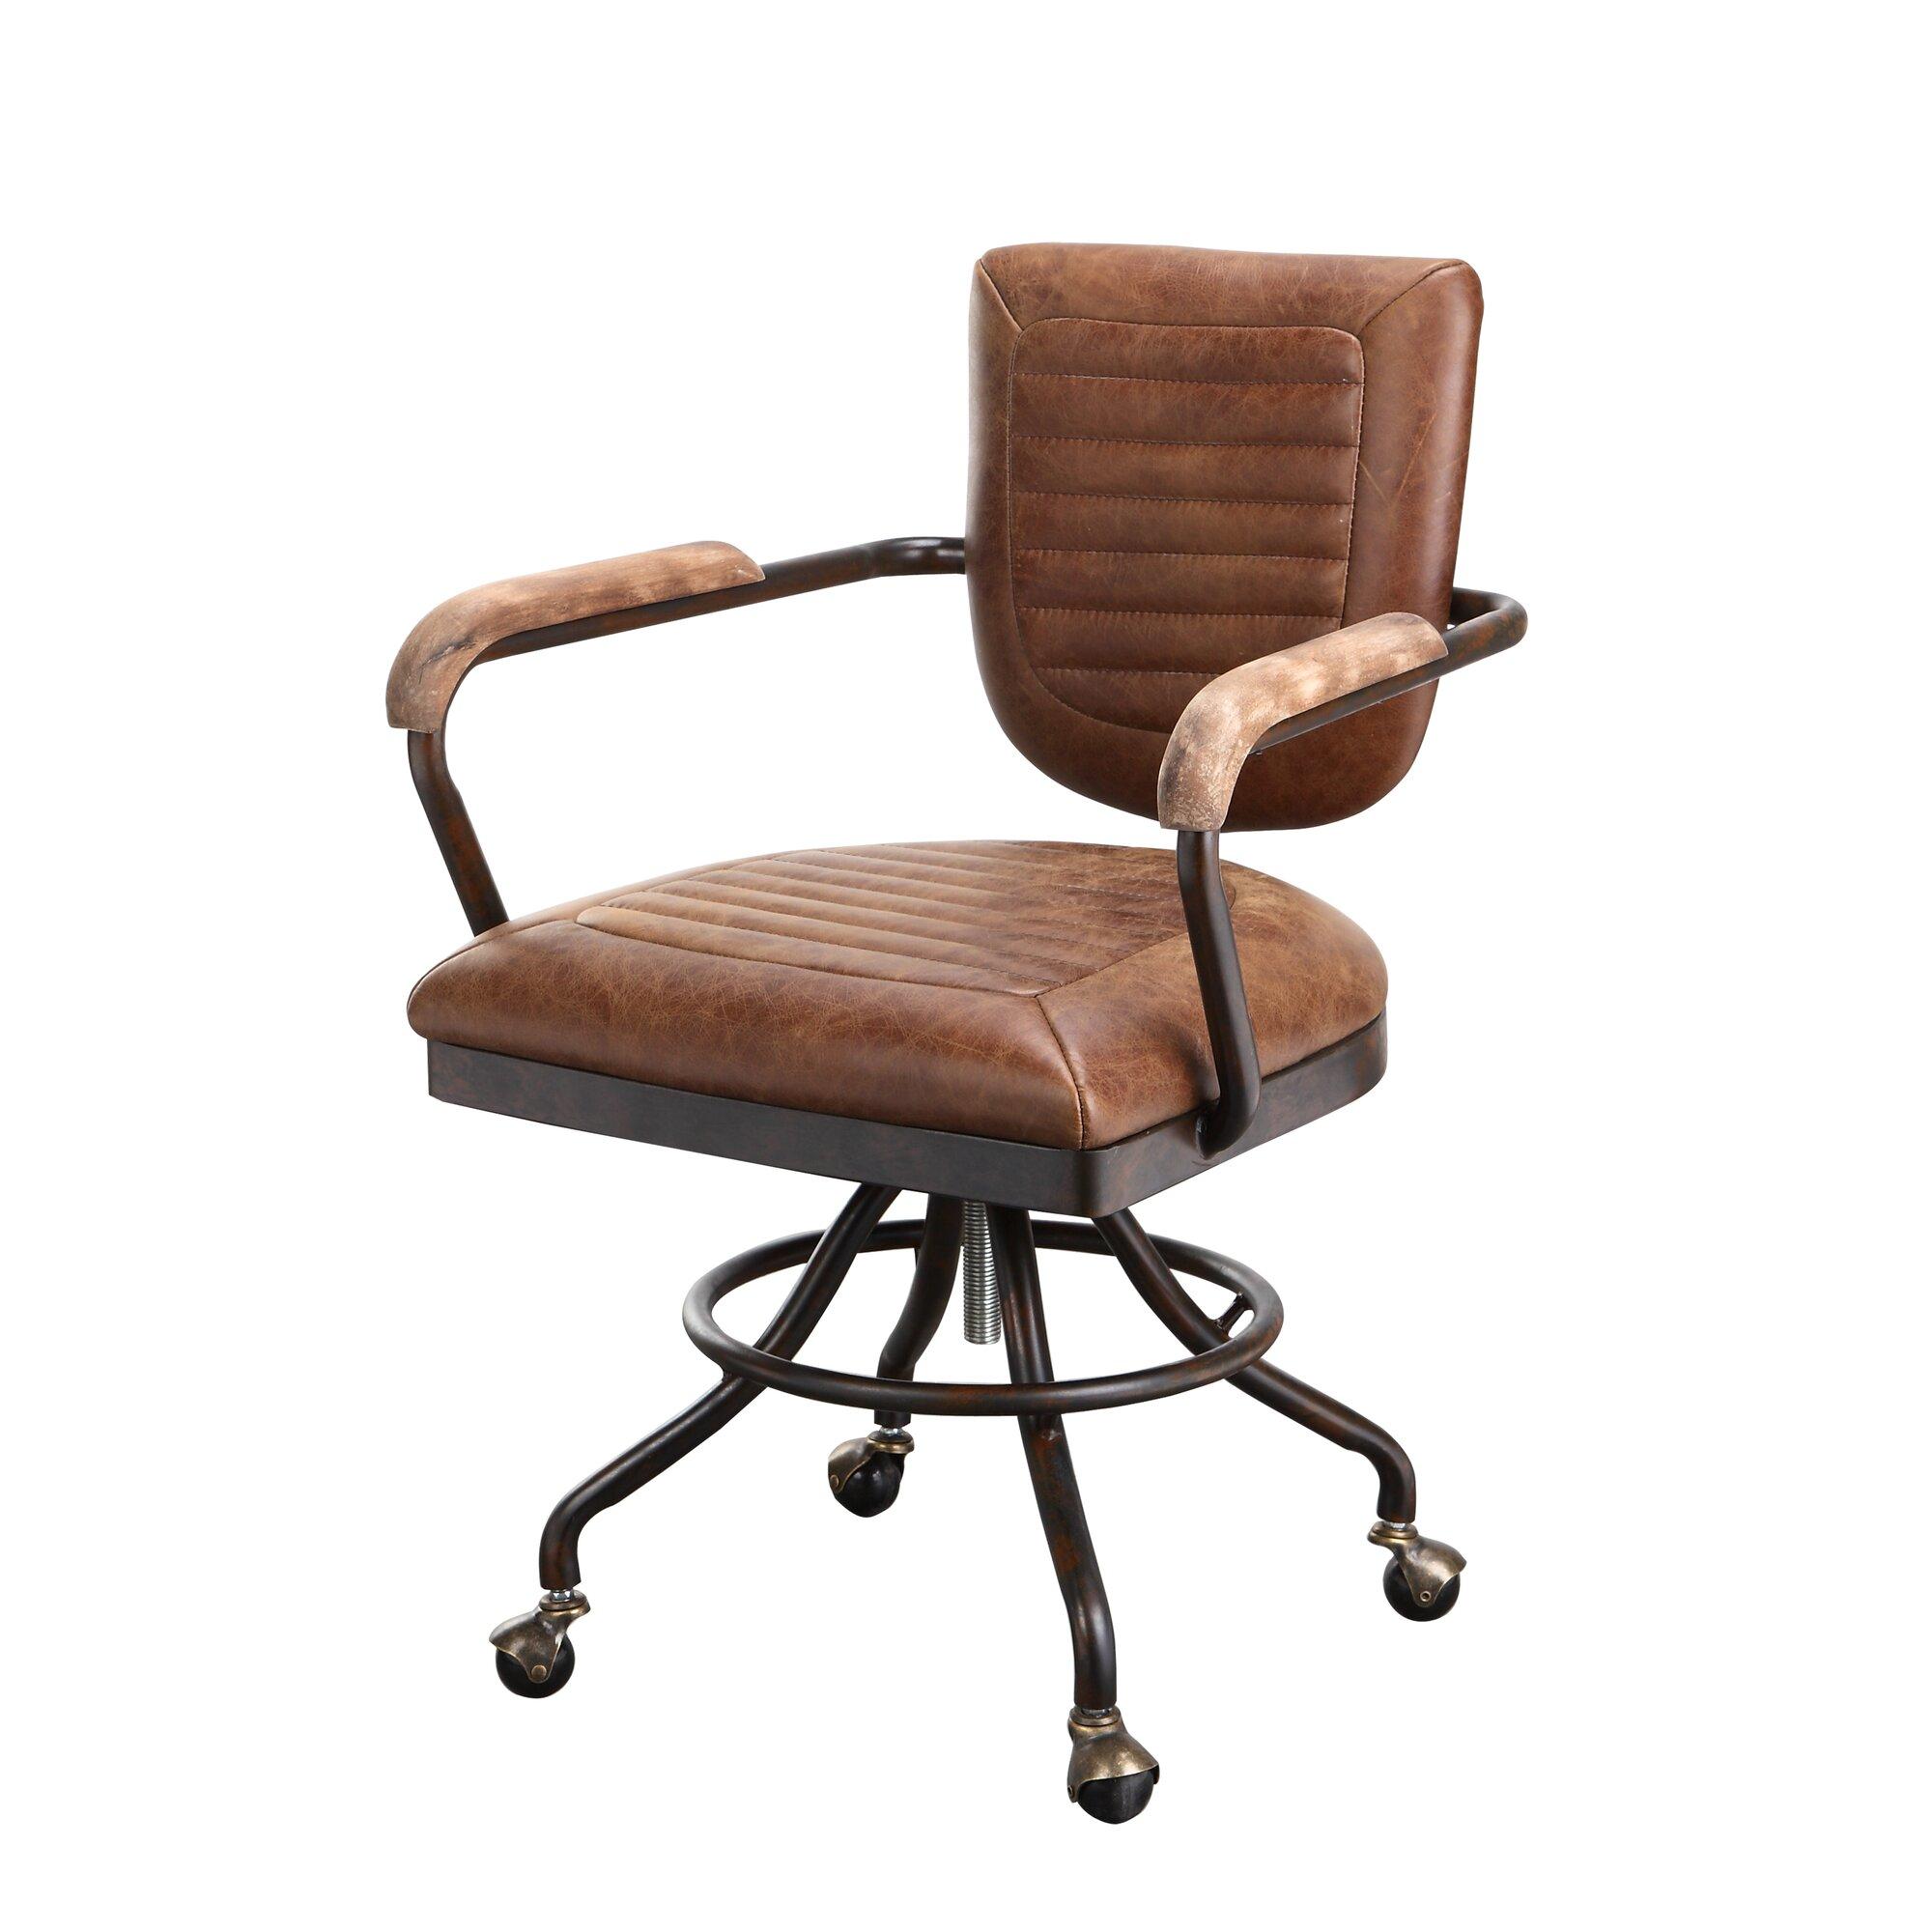 Tan leather office chair - Dubois Leather Desk Chair